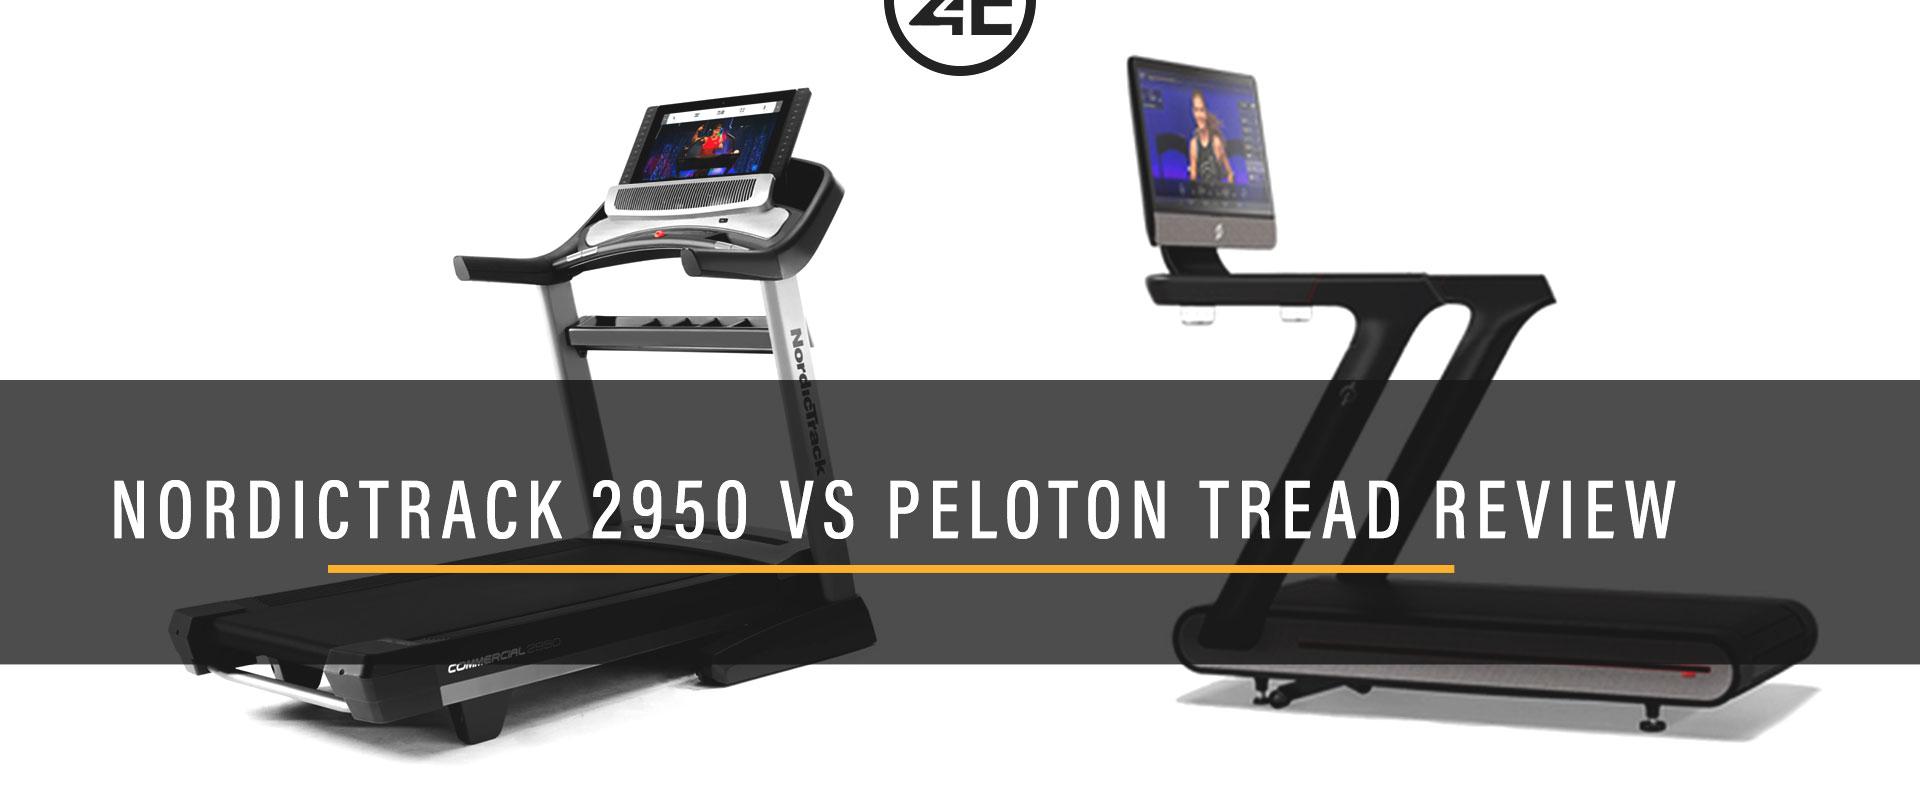 NordicTrack 2950 vs Peloton Tread